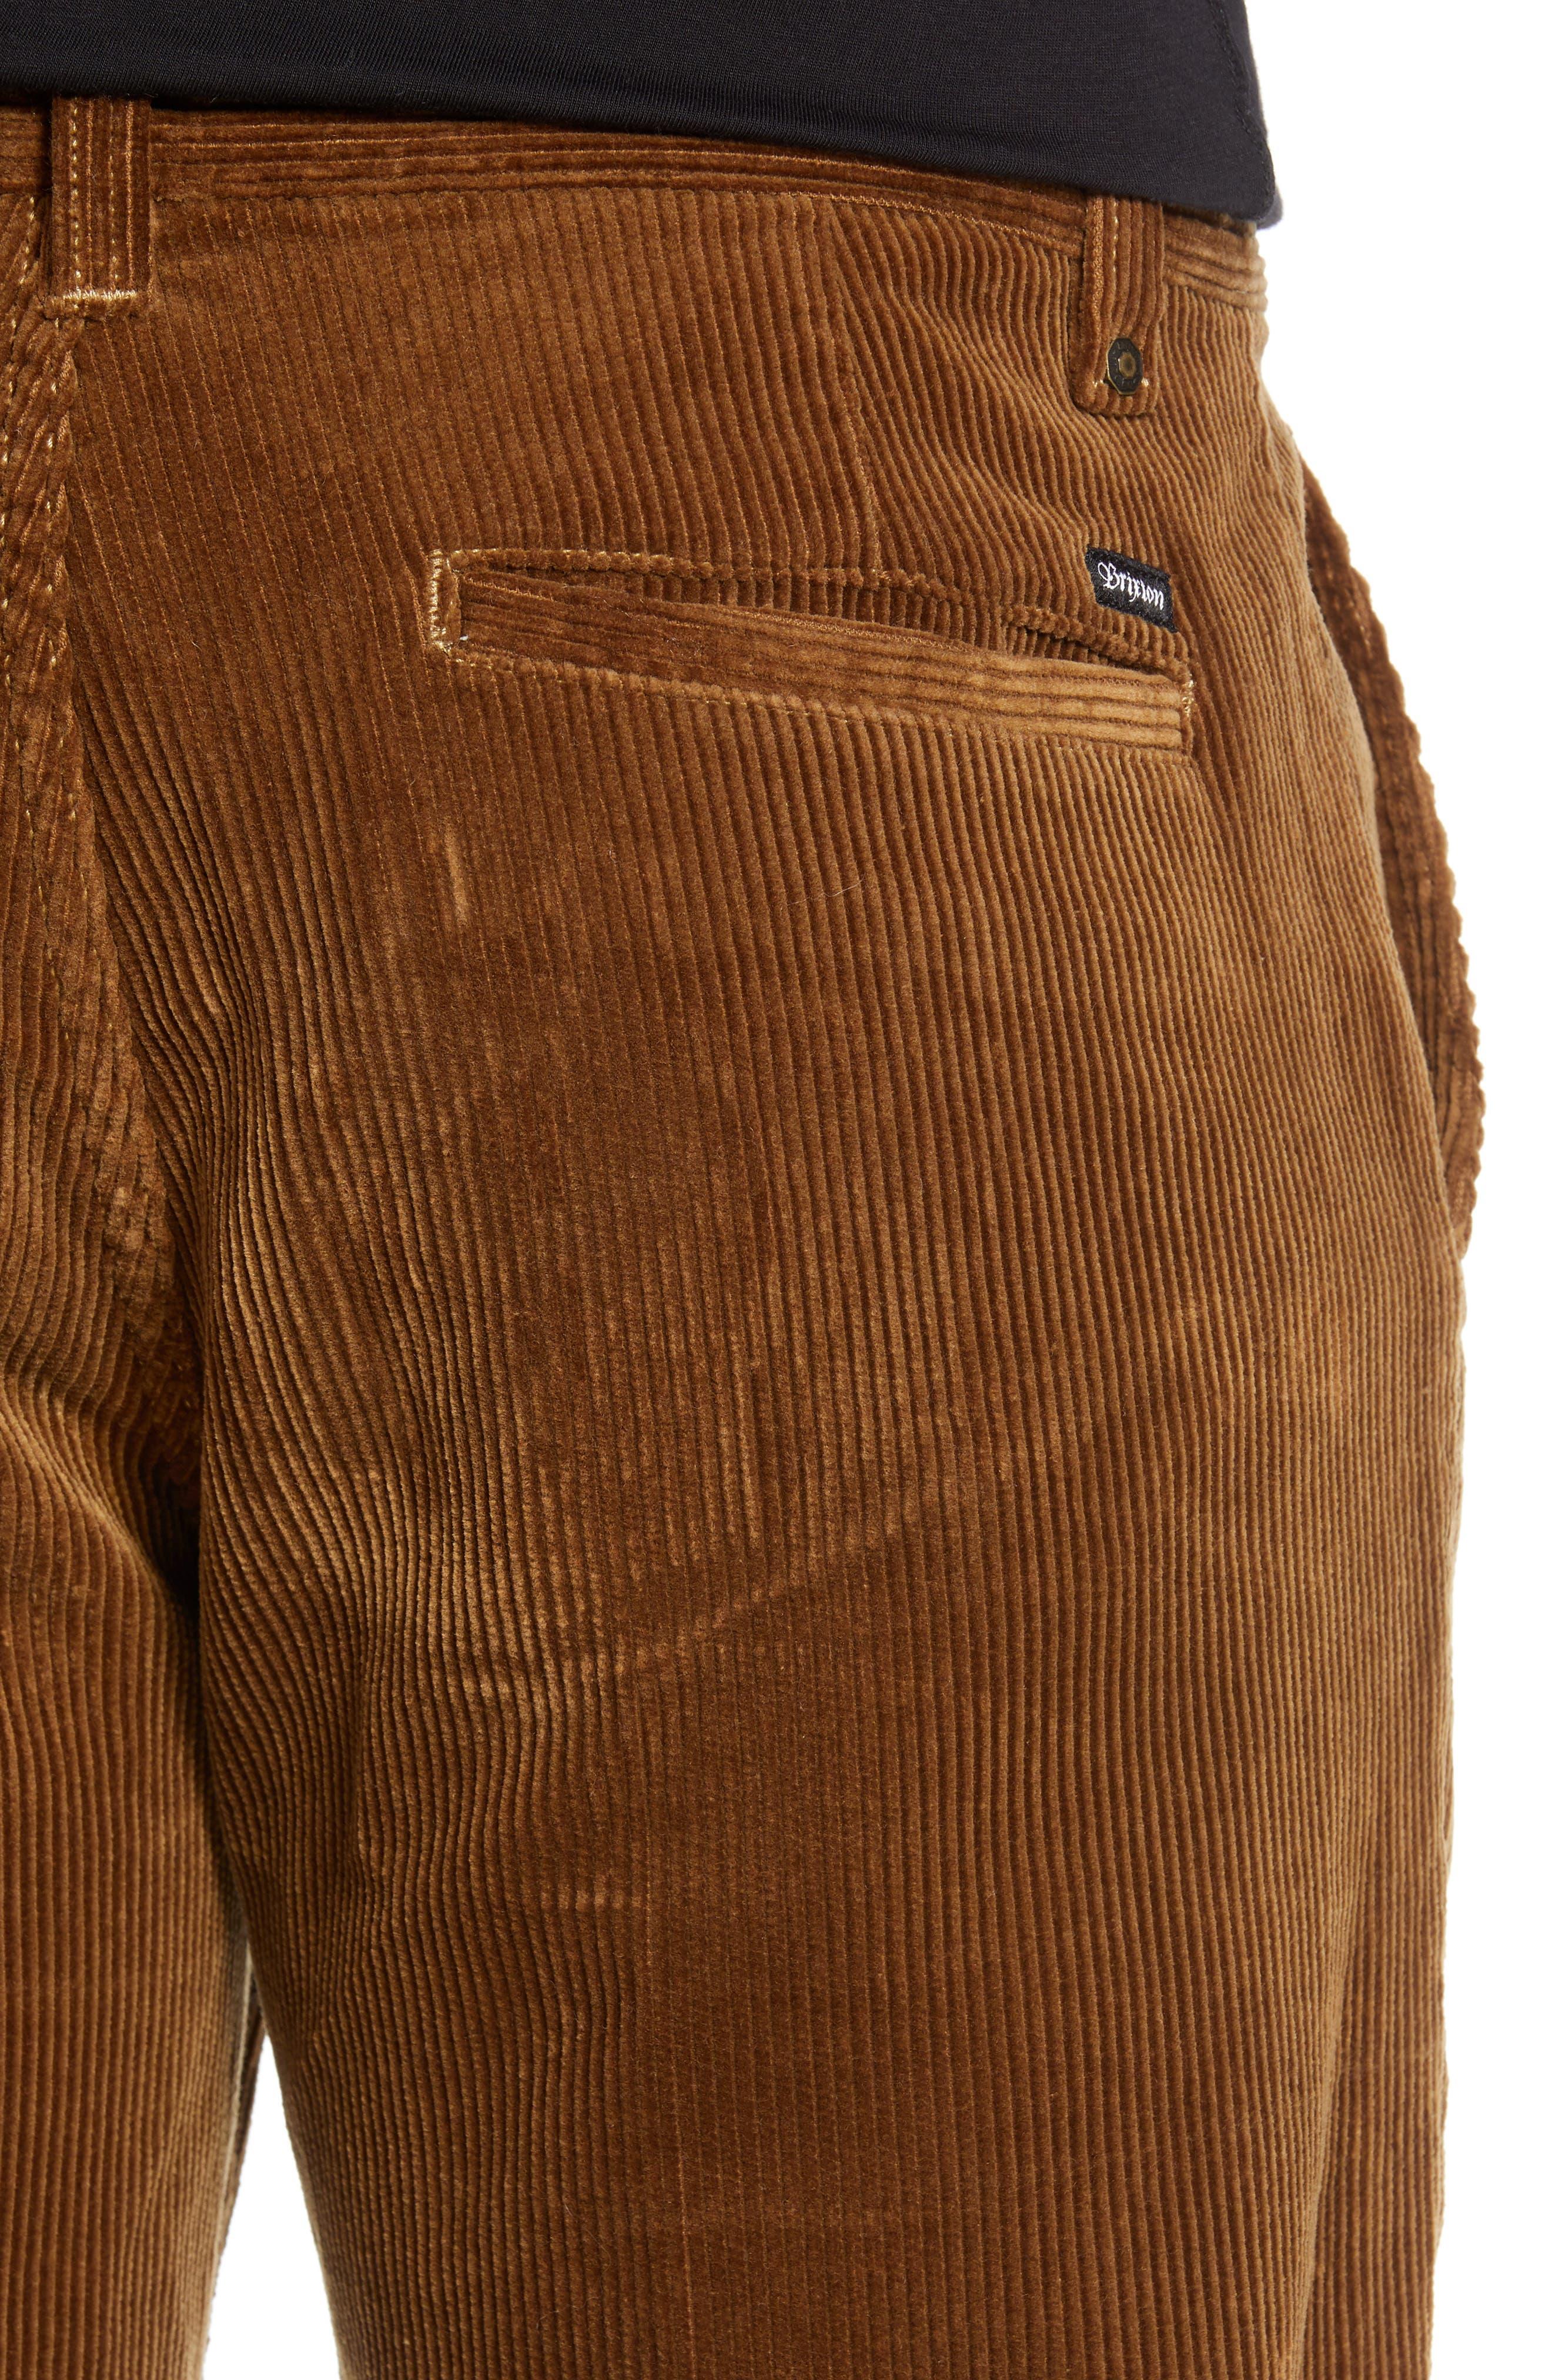 Fleet Rigid Chino Corduroy Pants,                             Alternate thumbnail 4, color,                             SIERRA